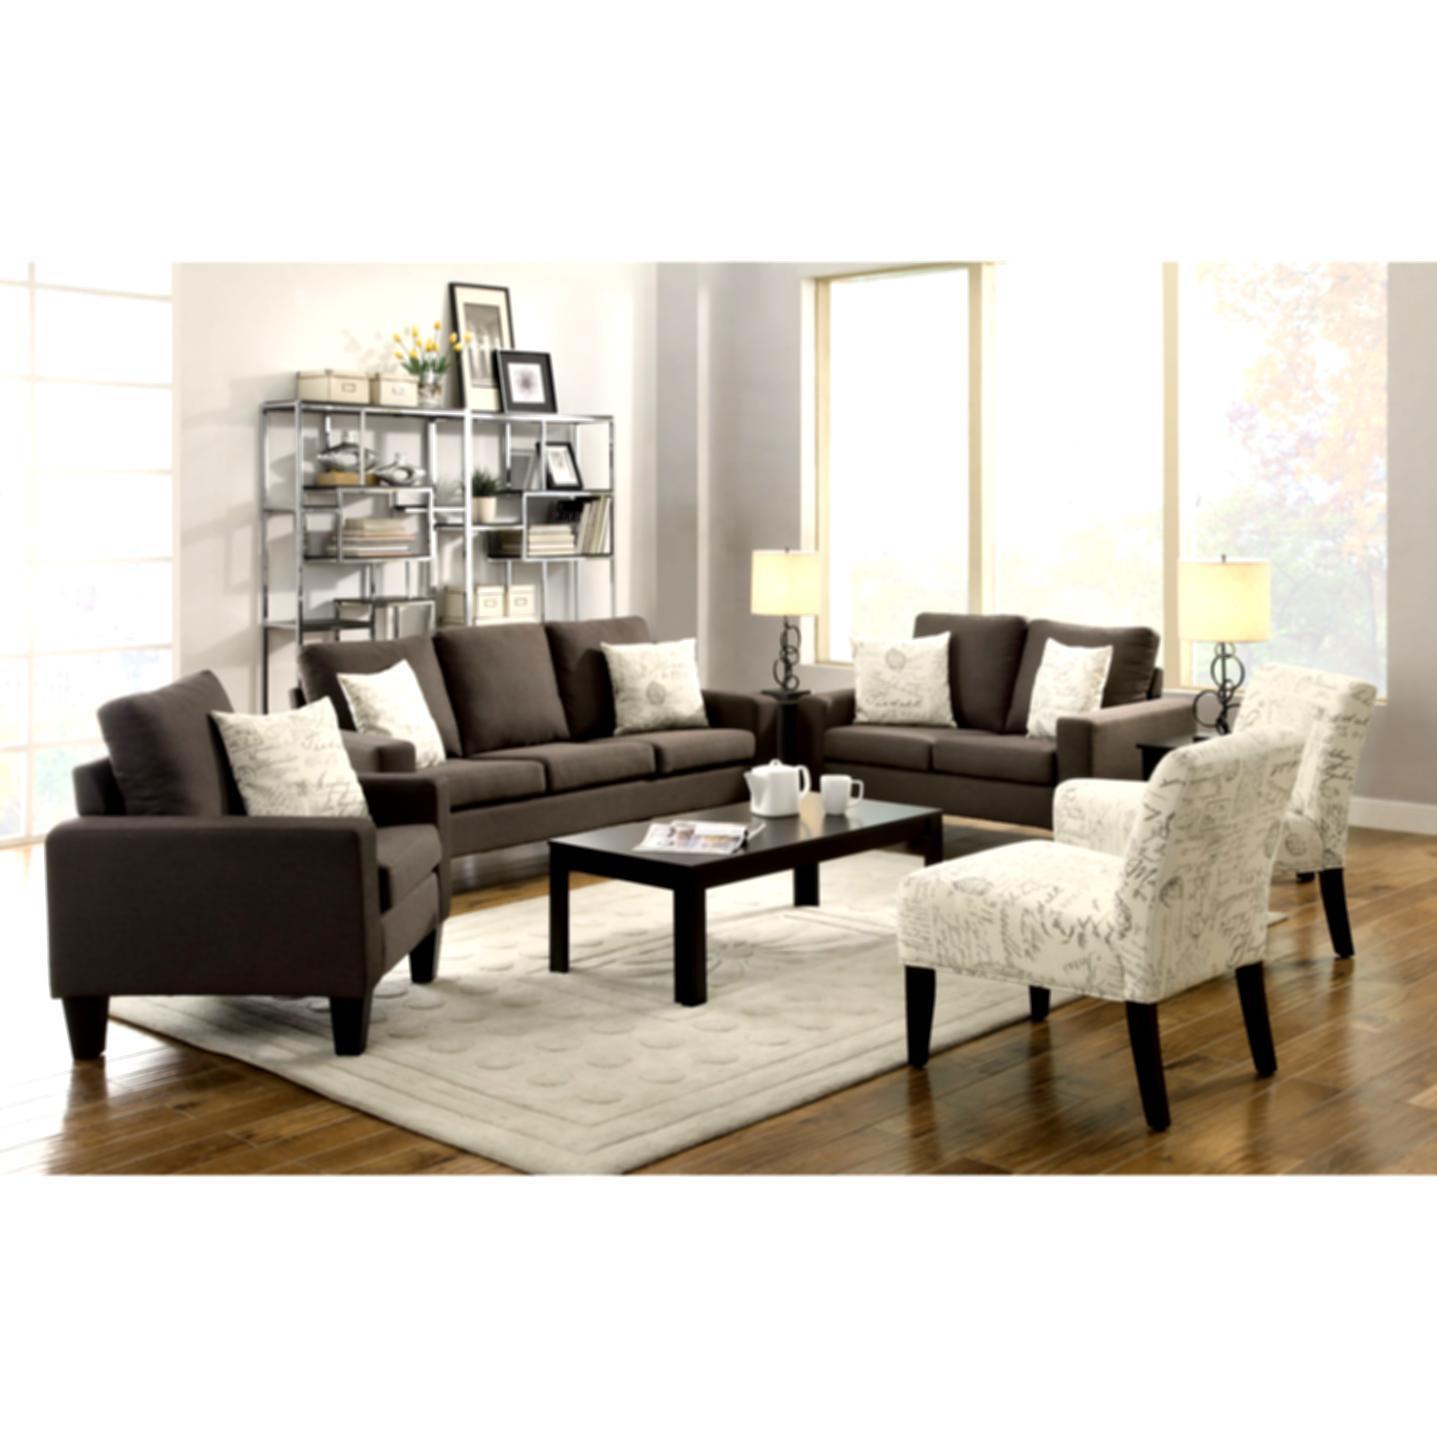 Best ideas about Wayfair Living Room Furniture . Save or Pin Reclining Living Room Sets Wayfair Regular Show Woodbridge Now.